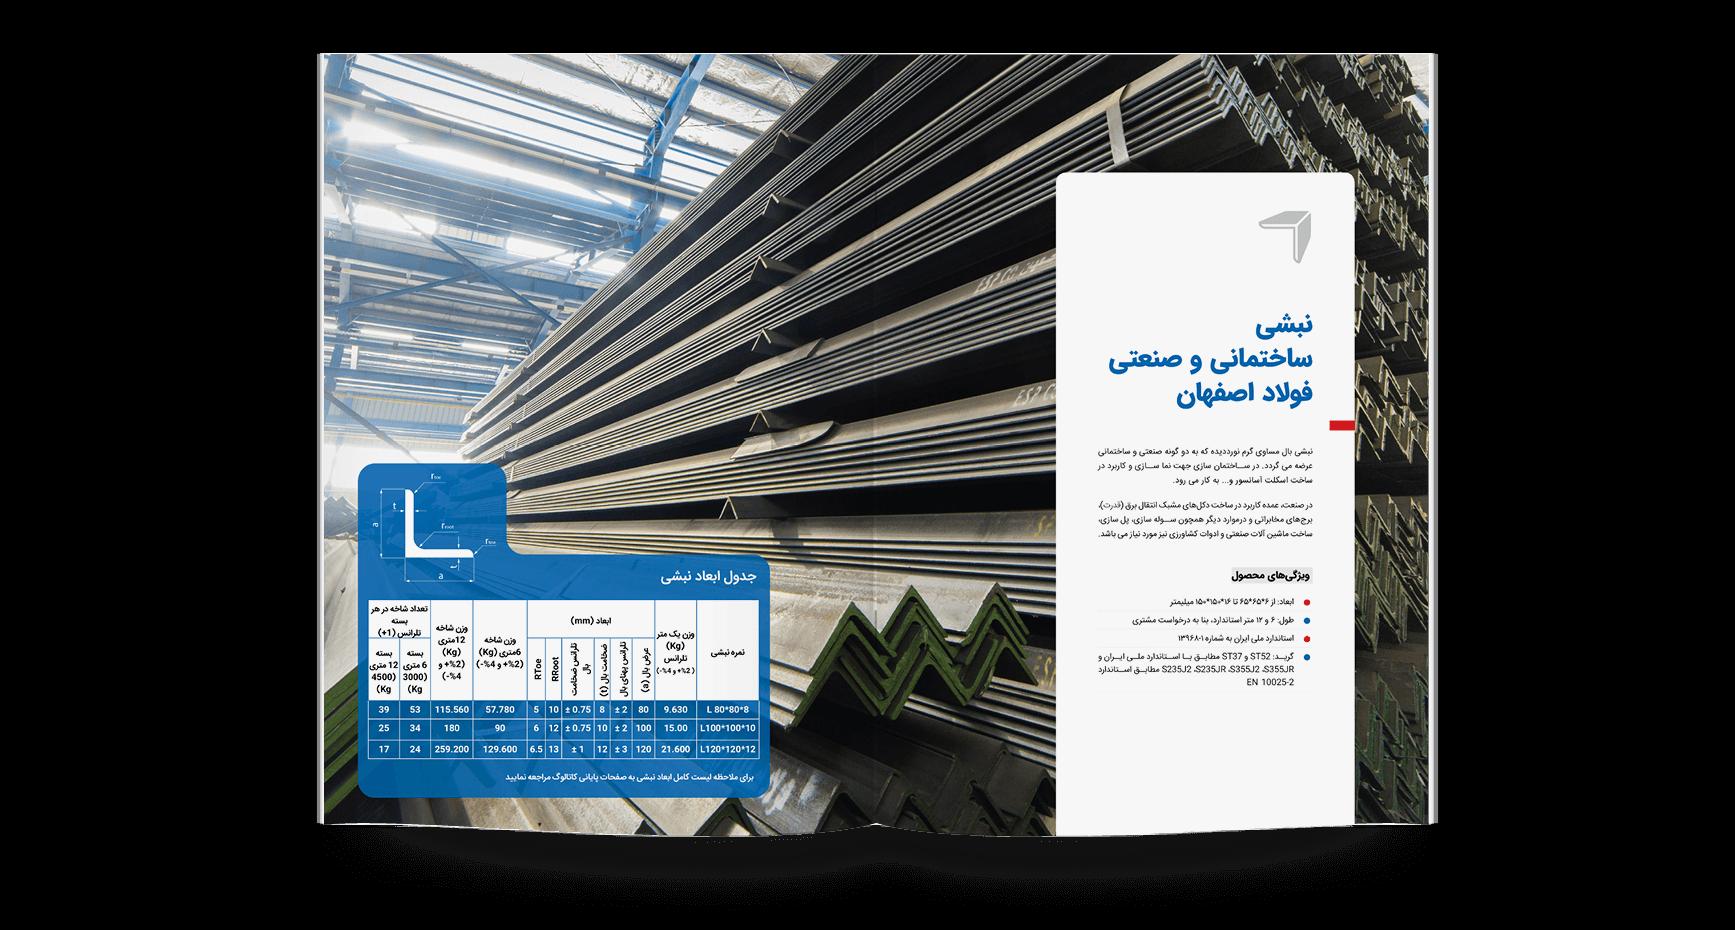 کاتالوگ فولاد اصفهان